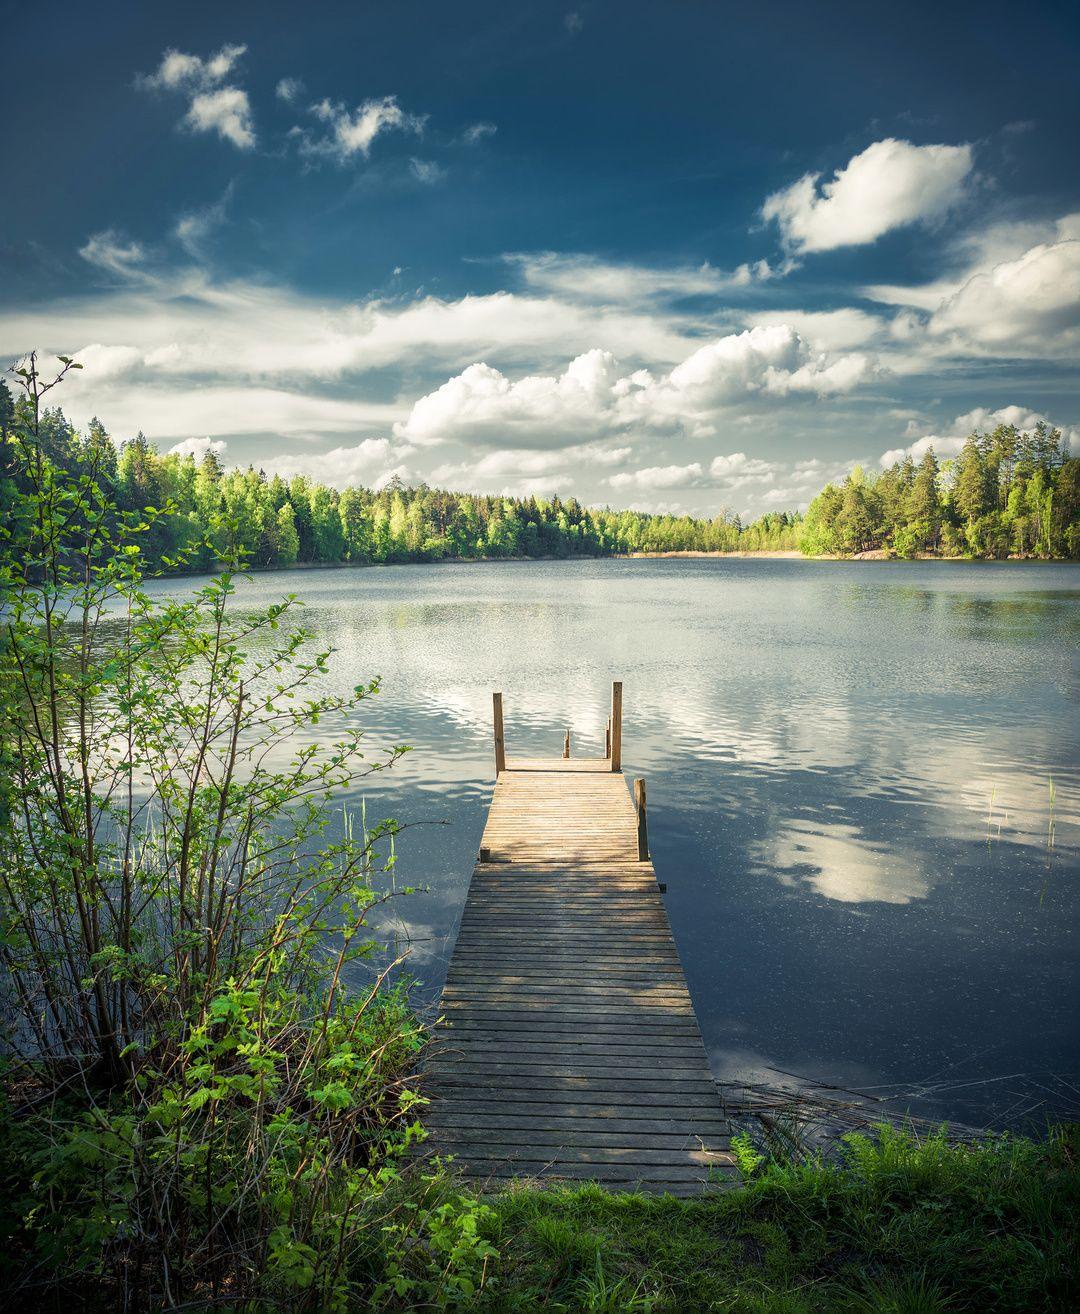 Amazing Sweden Photo By Maria Bytheriver Landscape Nature River Sea Lake Boat Sky Sun Fotografia Da Natureza Lindas Paisagens Fotografia De Paisagem